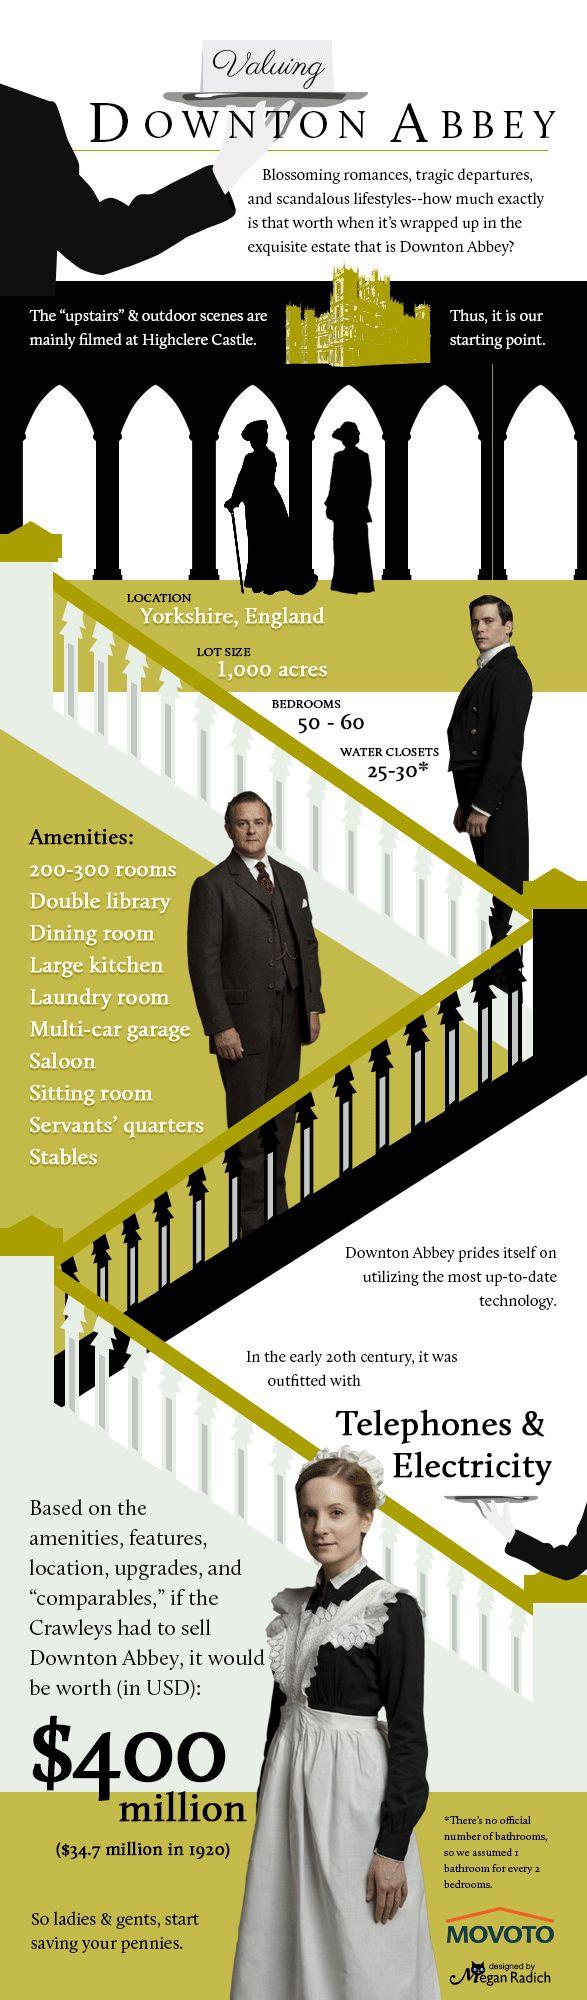 Valuing Downton Abbey...400 million +